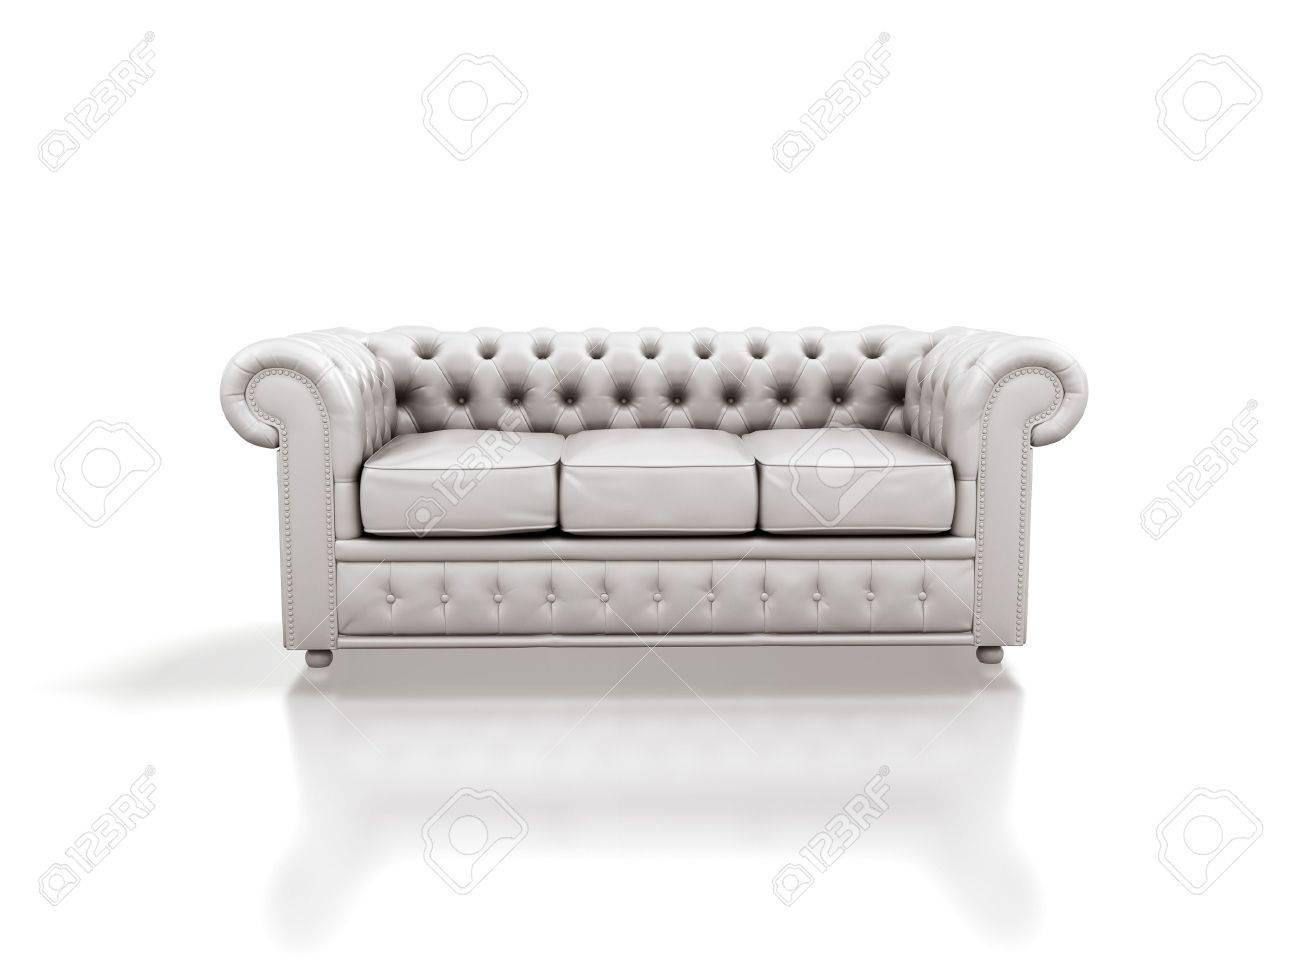 White Leather Sofa Isolated White Background Stock